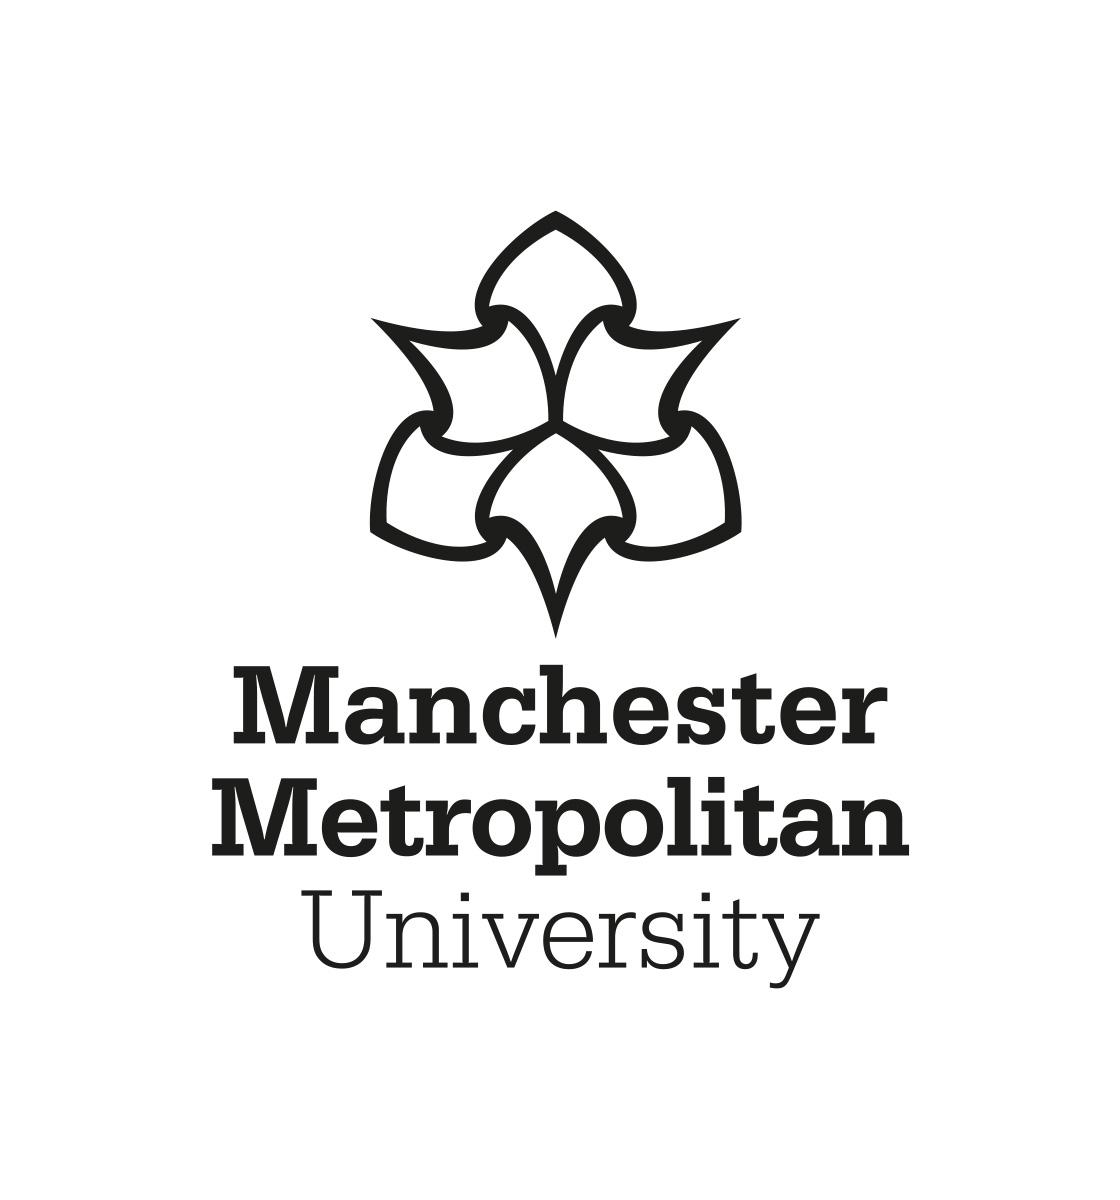 https://www.pro-manchester.co.uk/wp-content/uploads/2021/06/Stacked-Logo.jpg